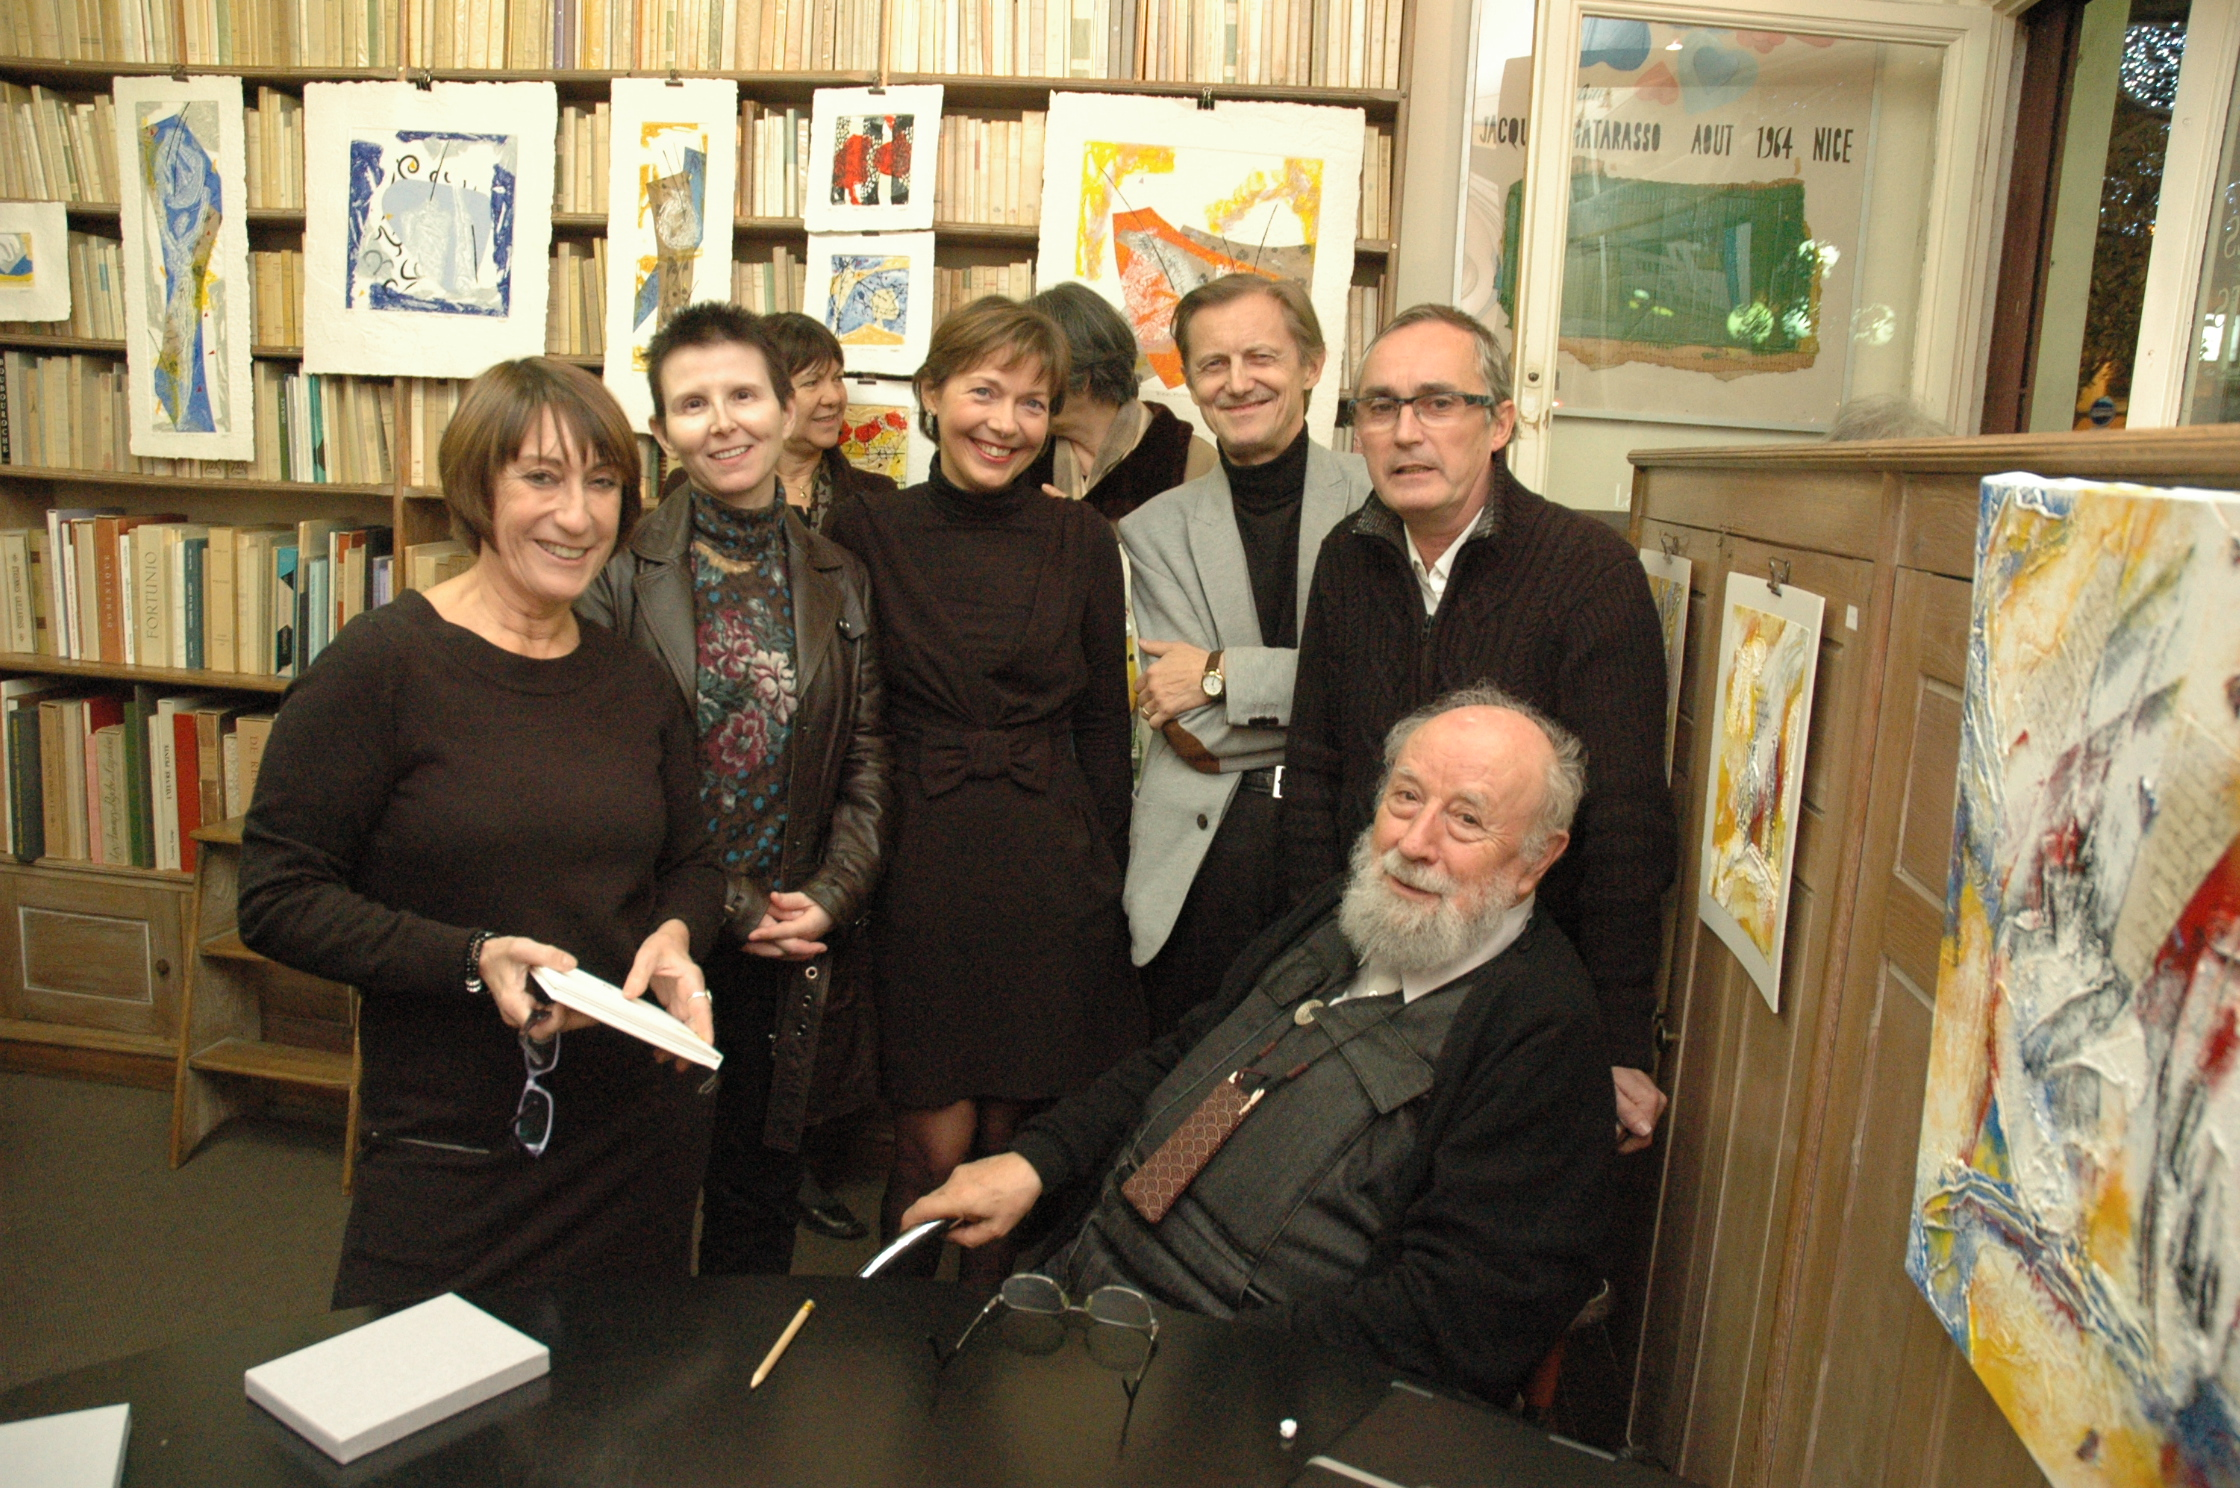 L. Matarasso, R. Detambel, FMA, S. Palsson, B. Alligand, M. Butor